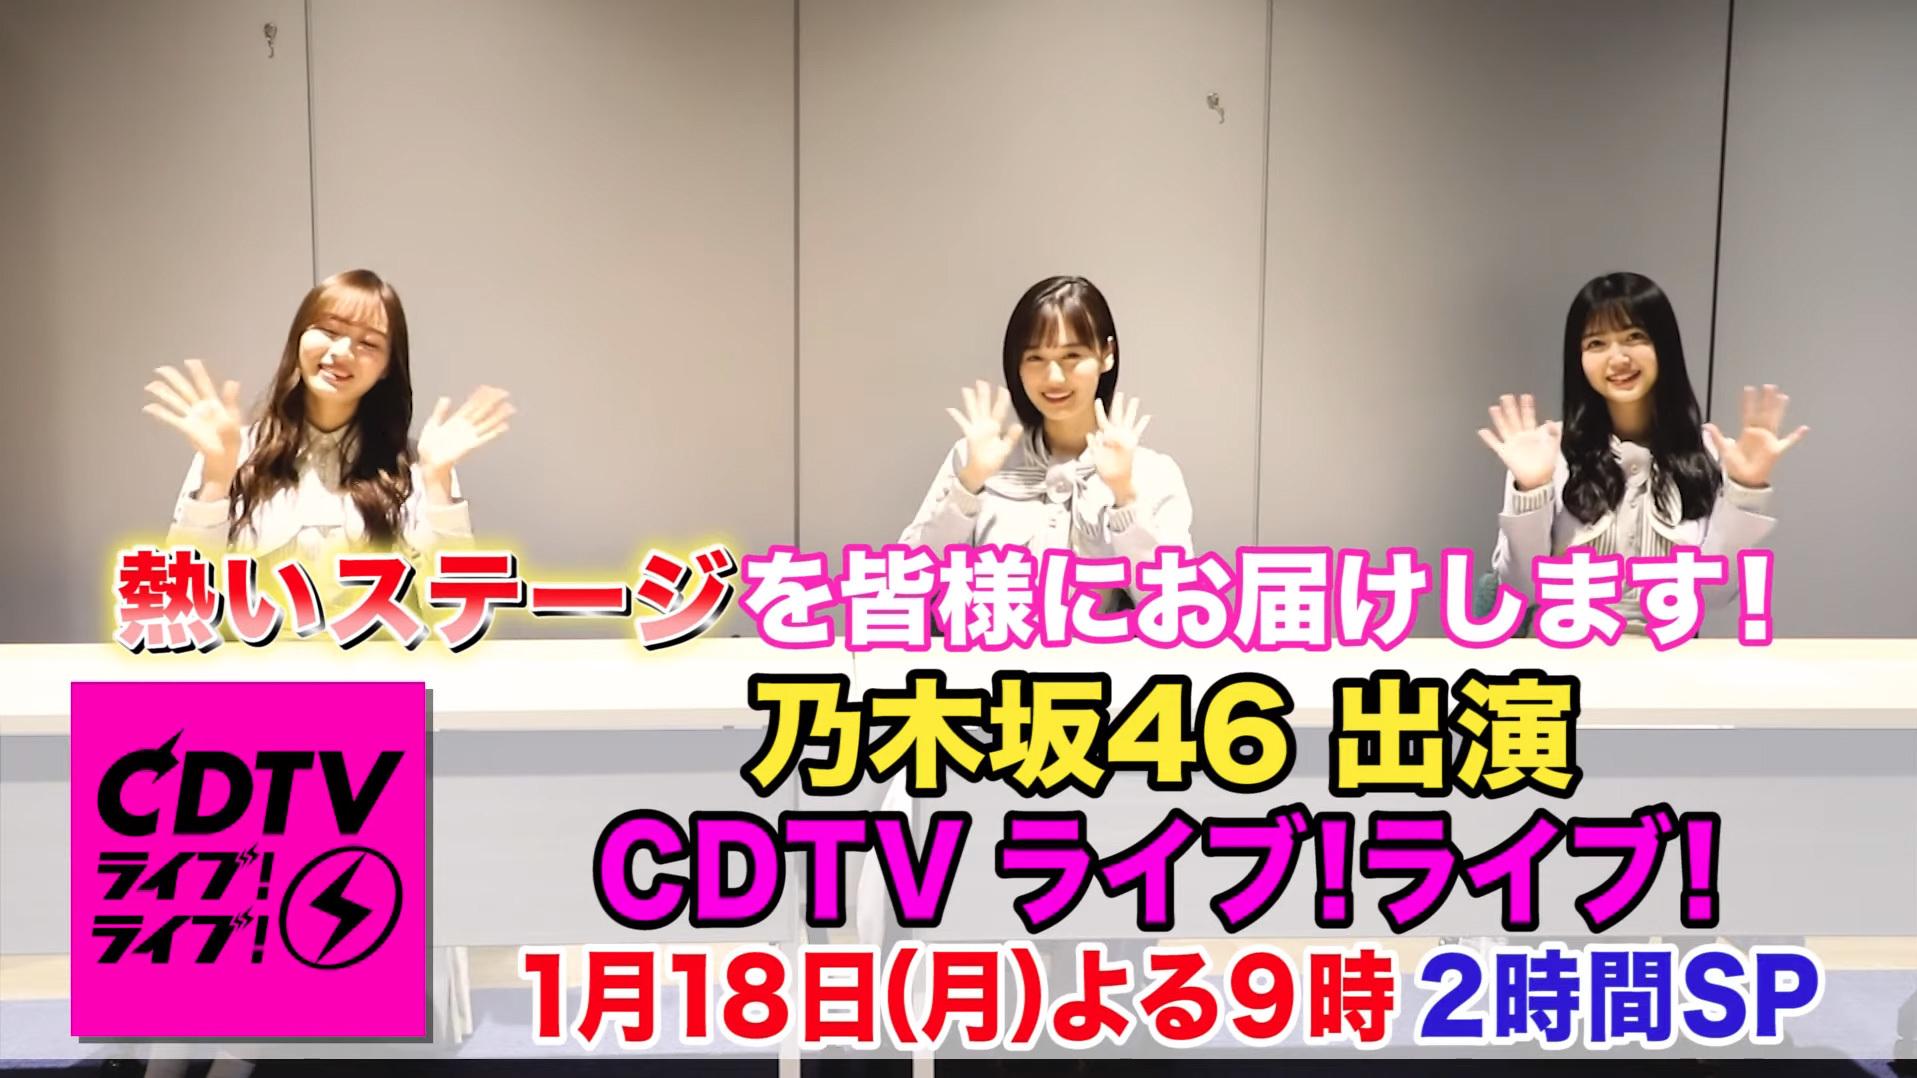 CDTVライブライブ 乃木坂46